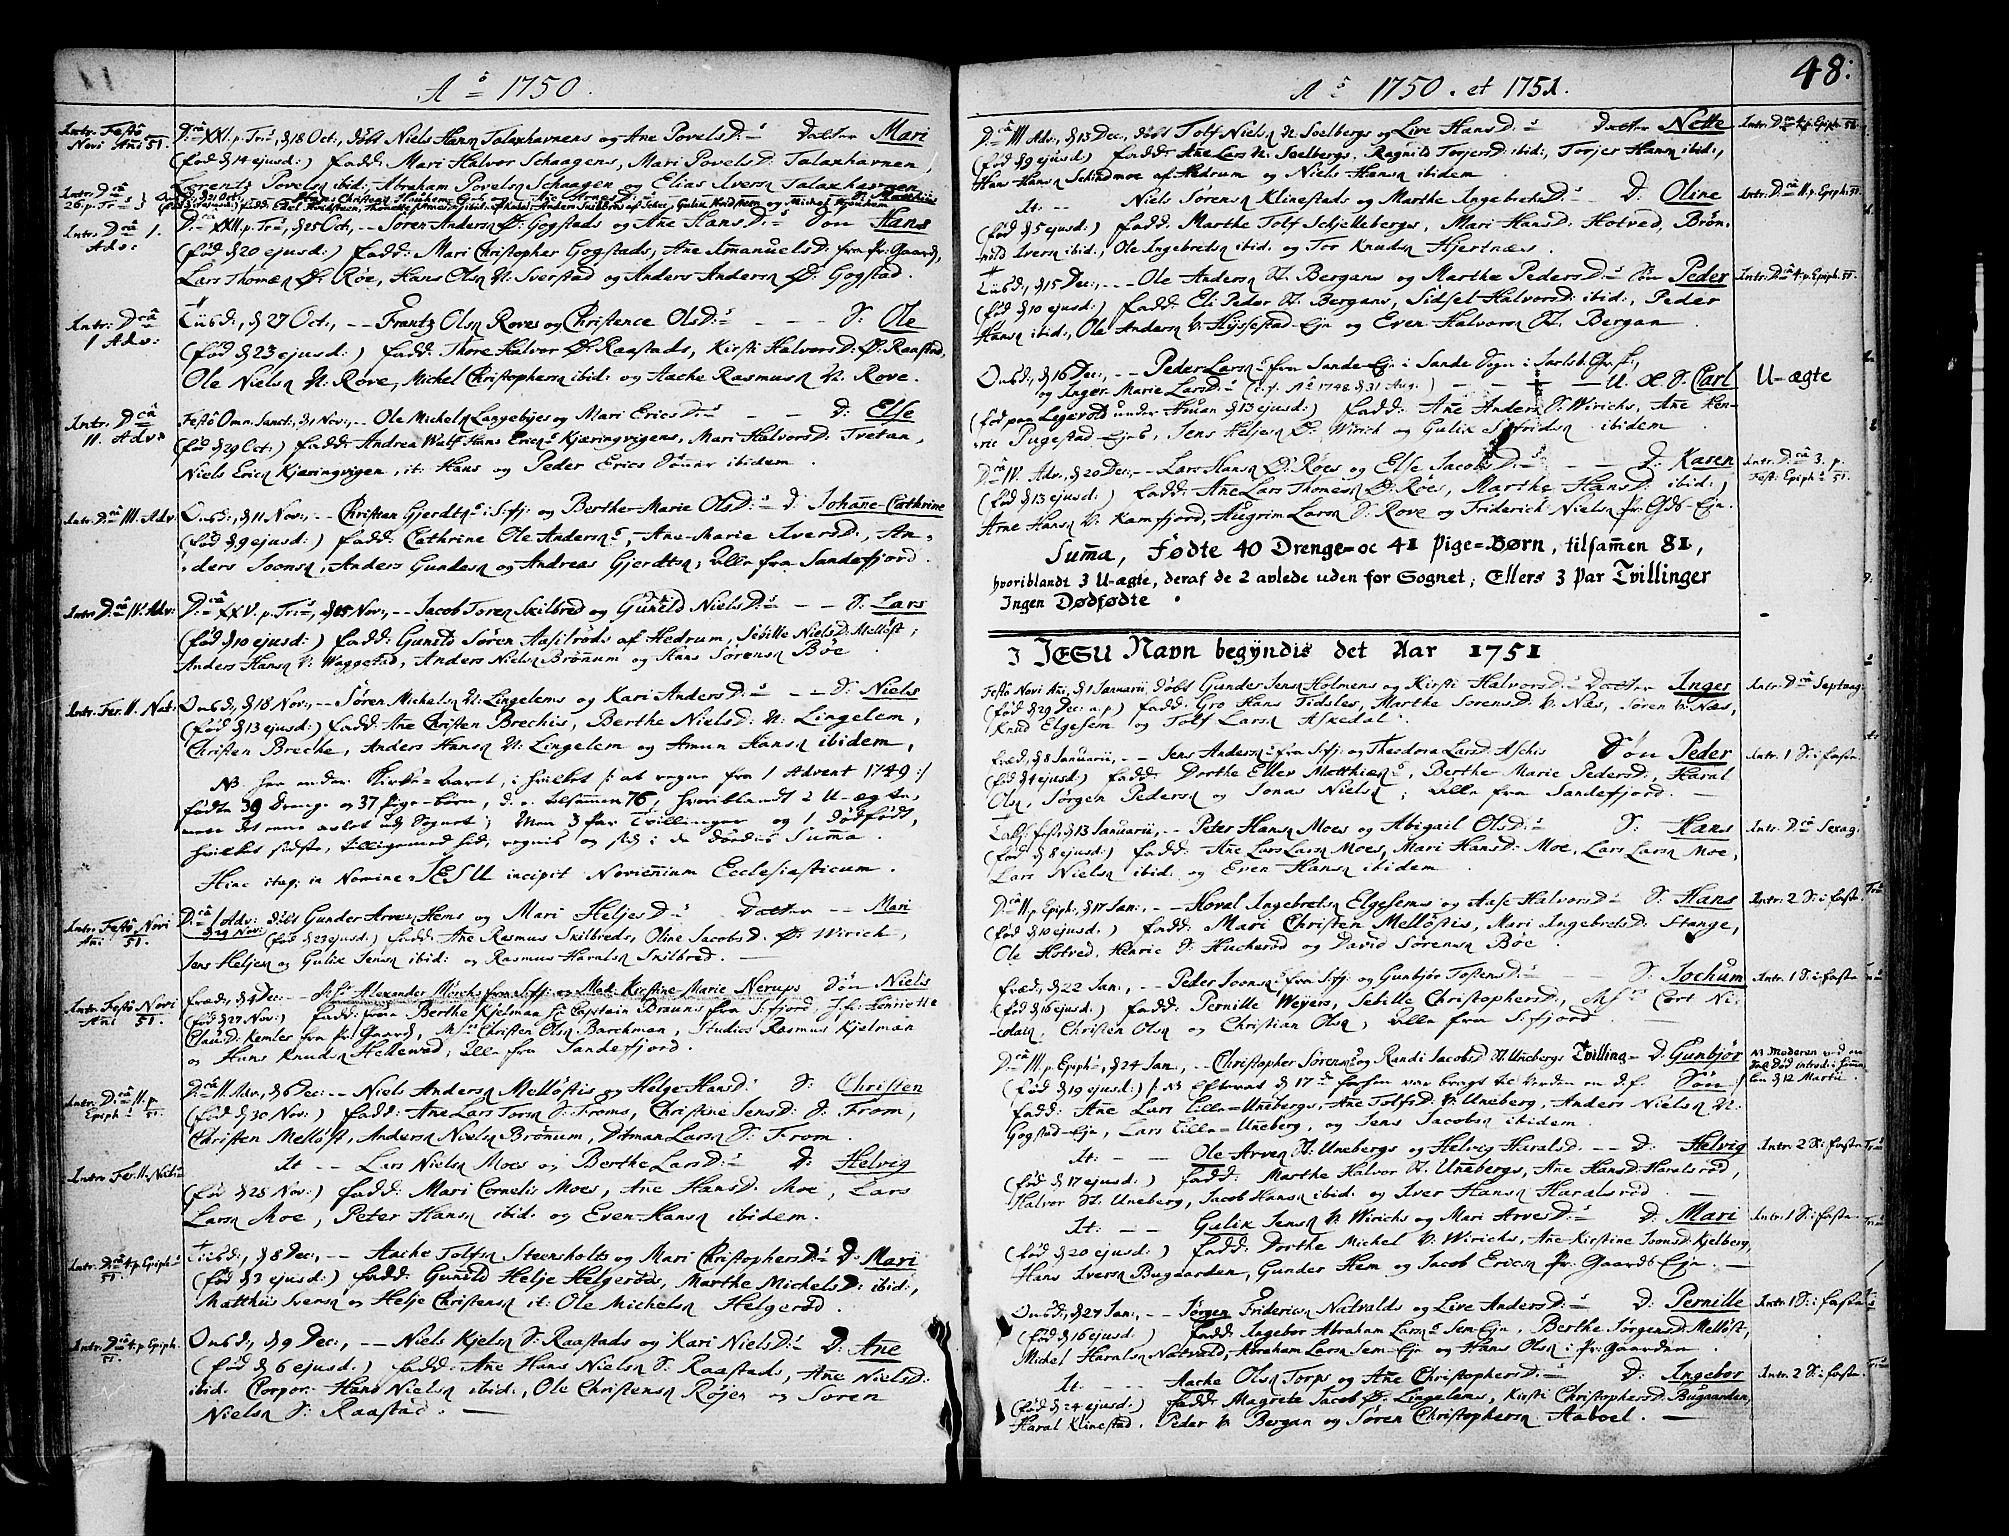 SAKO, Sandar kirkebøker, F/Fa/L0002: Parish register (official) no. 2, 1733-1788, p. 48